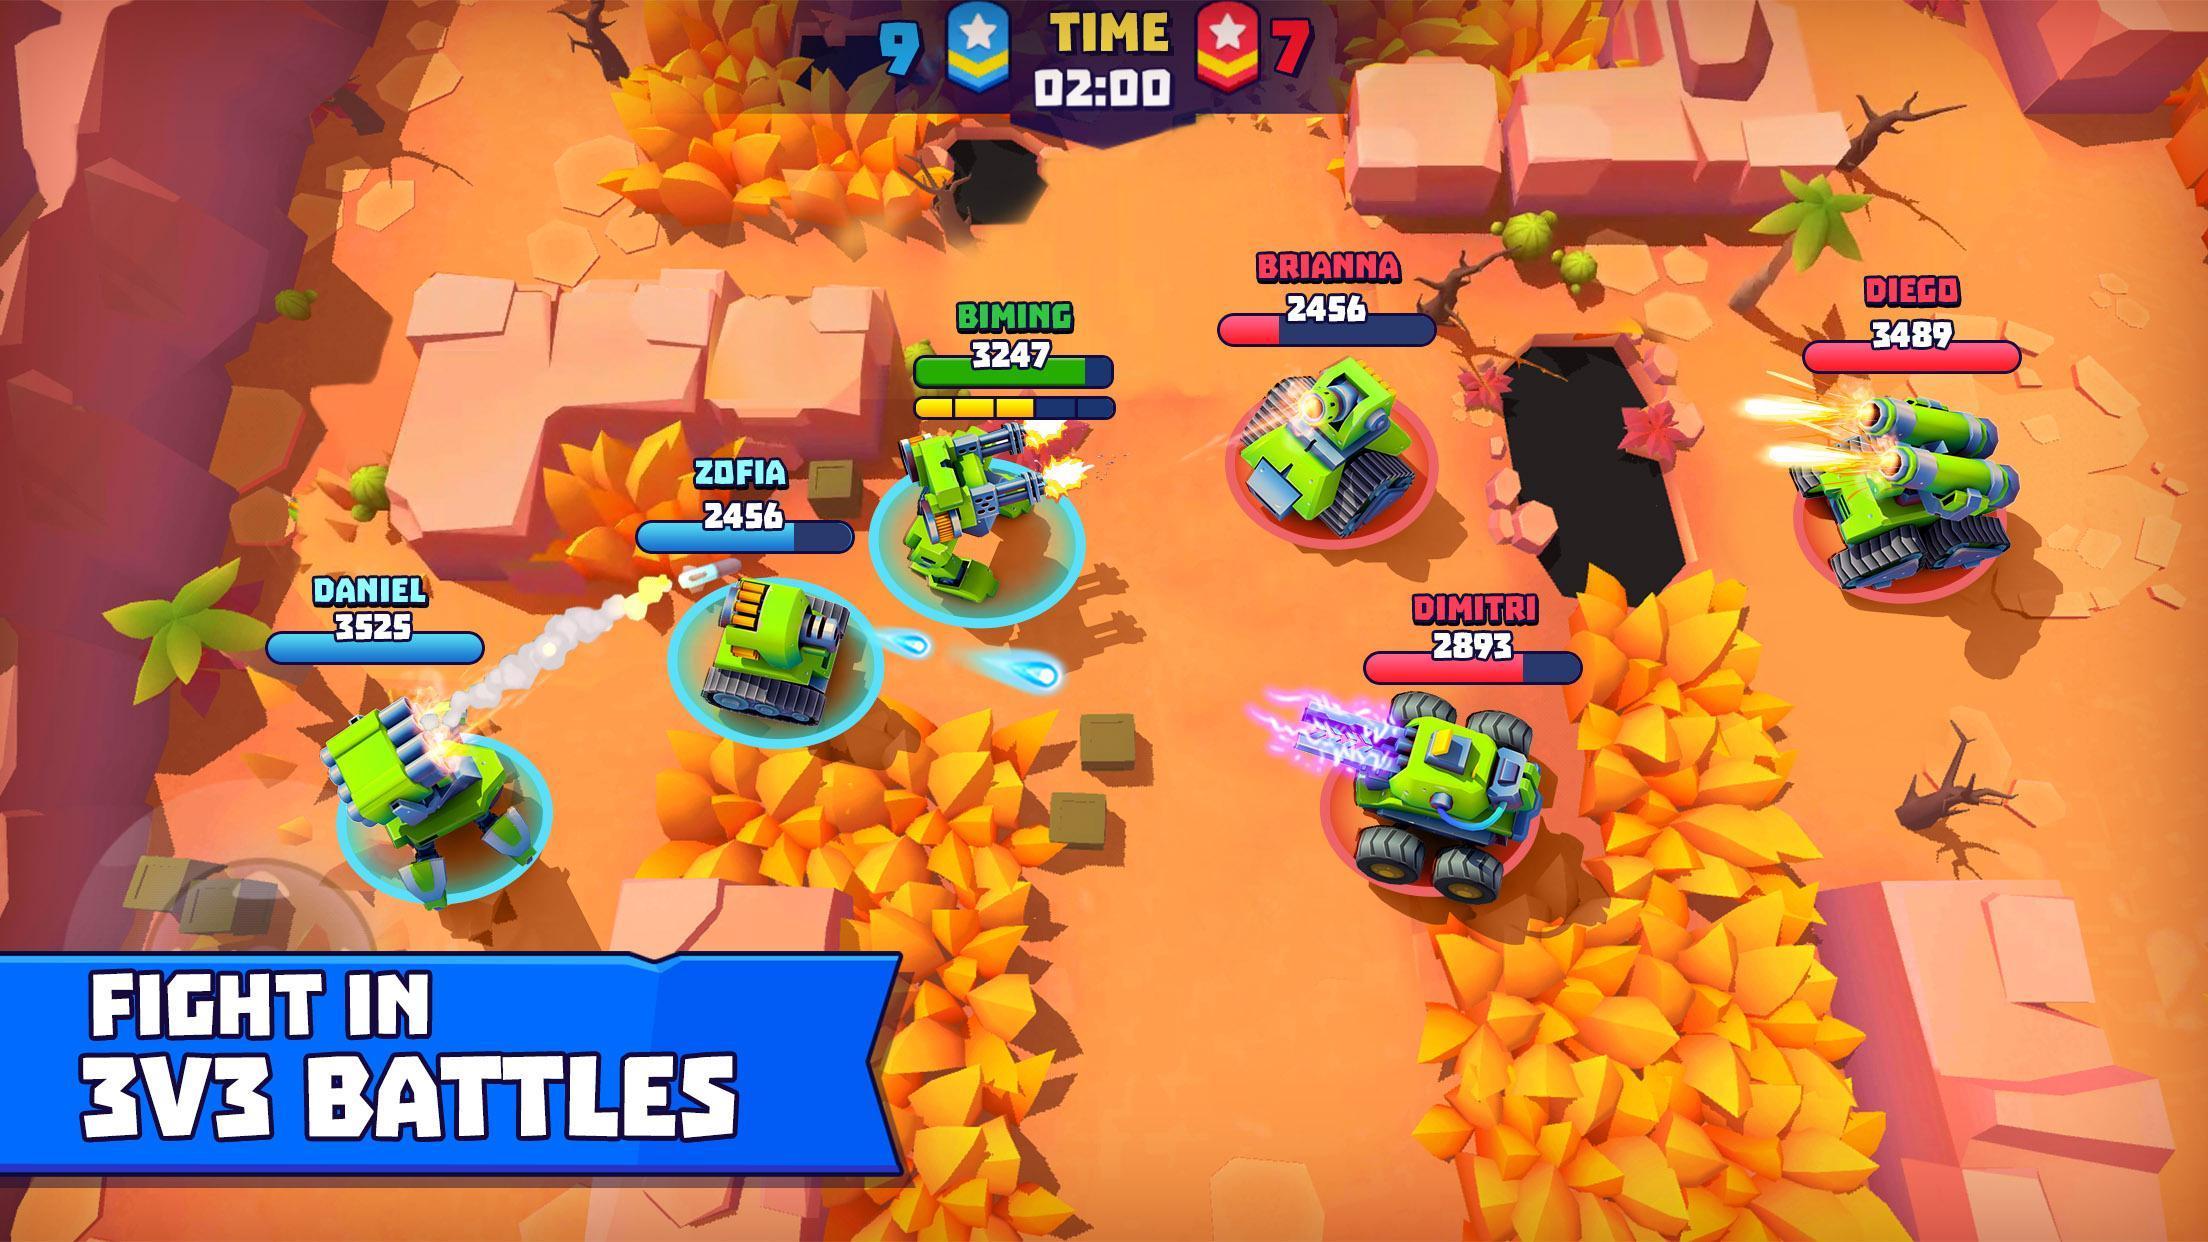 Tanks A Lot! - Realtime Multiplayer Battle Arena 2.56 Screenshot 1